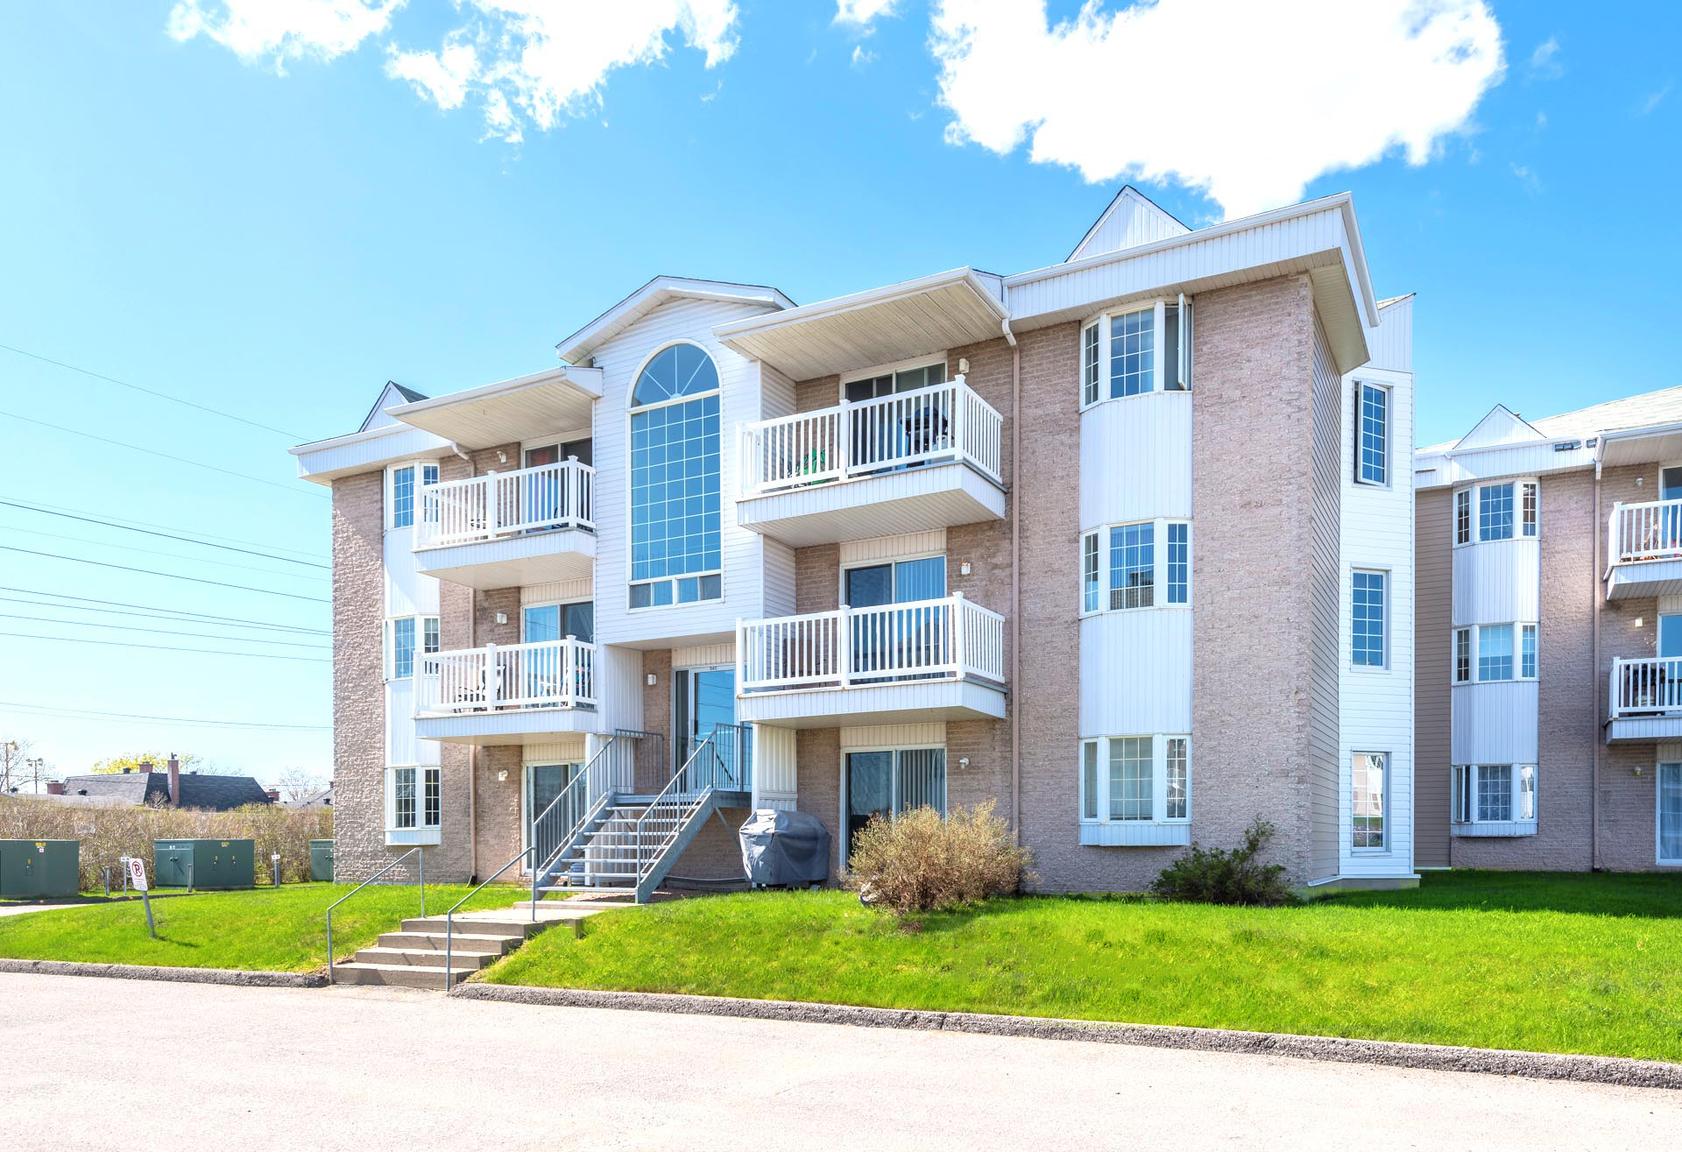 1 bedroom Apartments for rent in Quebec City at Les Appartements du Verdier - Photo 23 - RentQuebecApartments – L407122